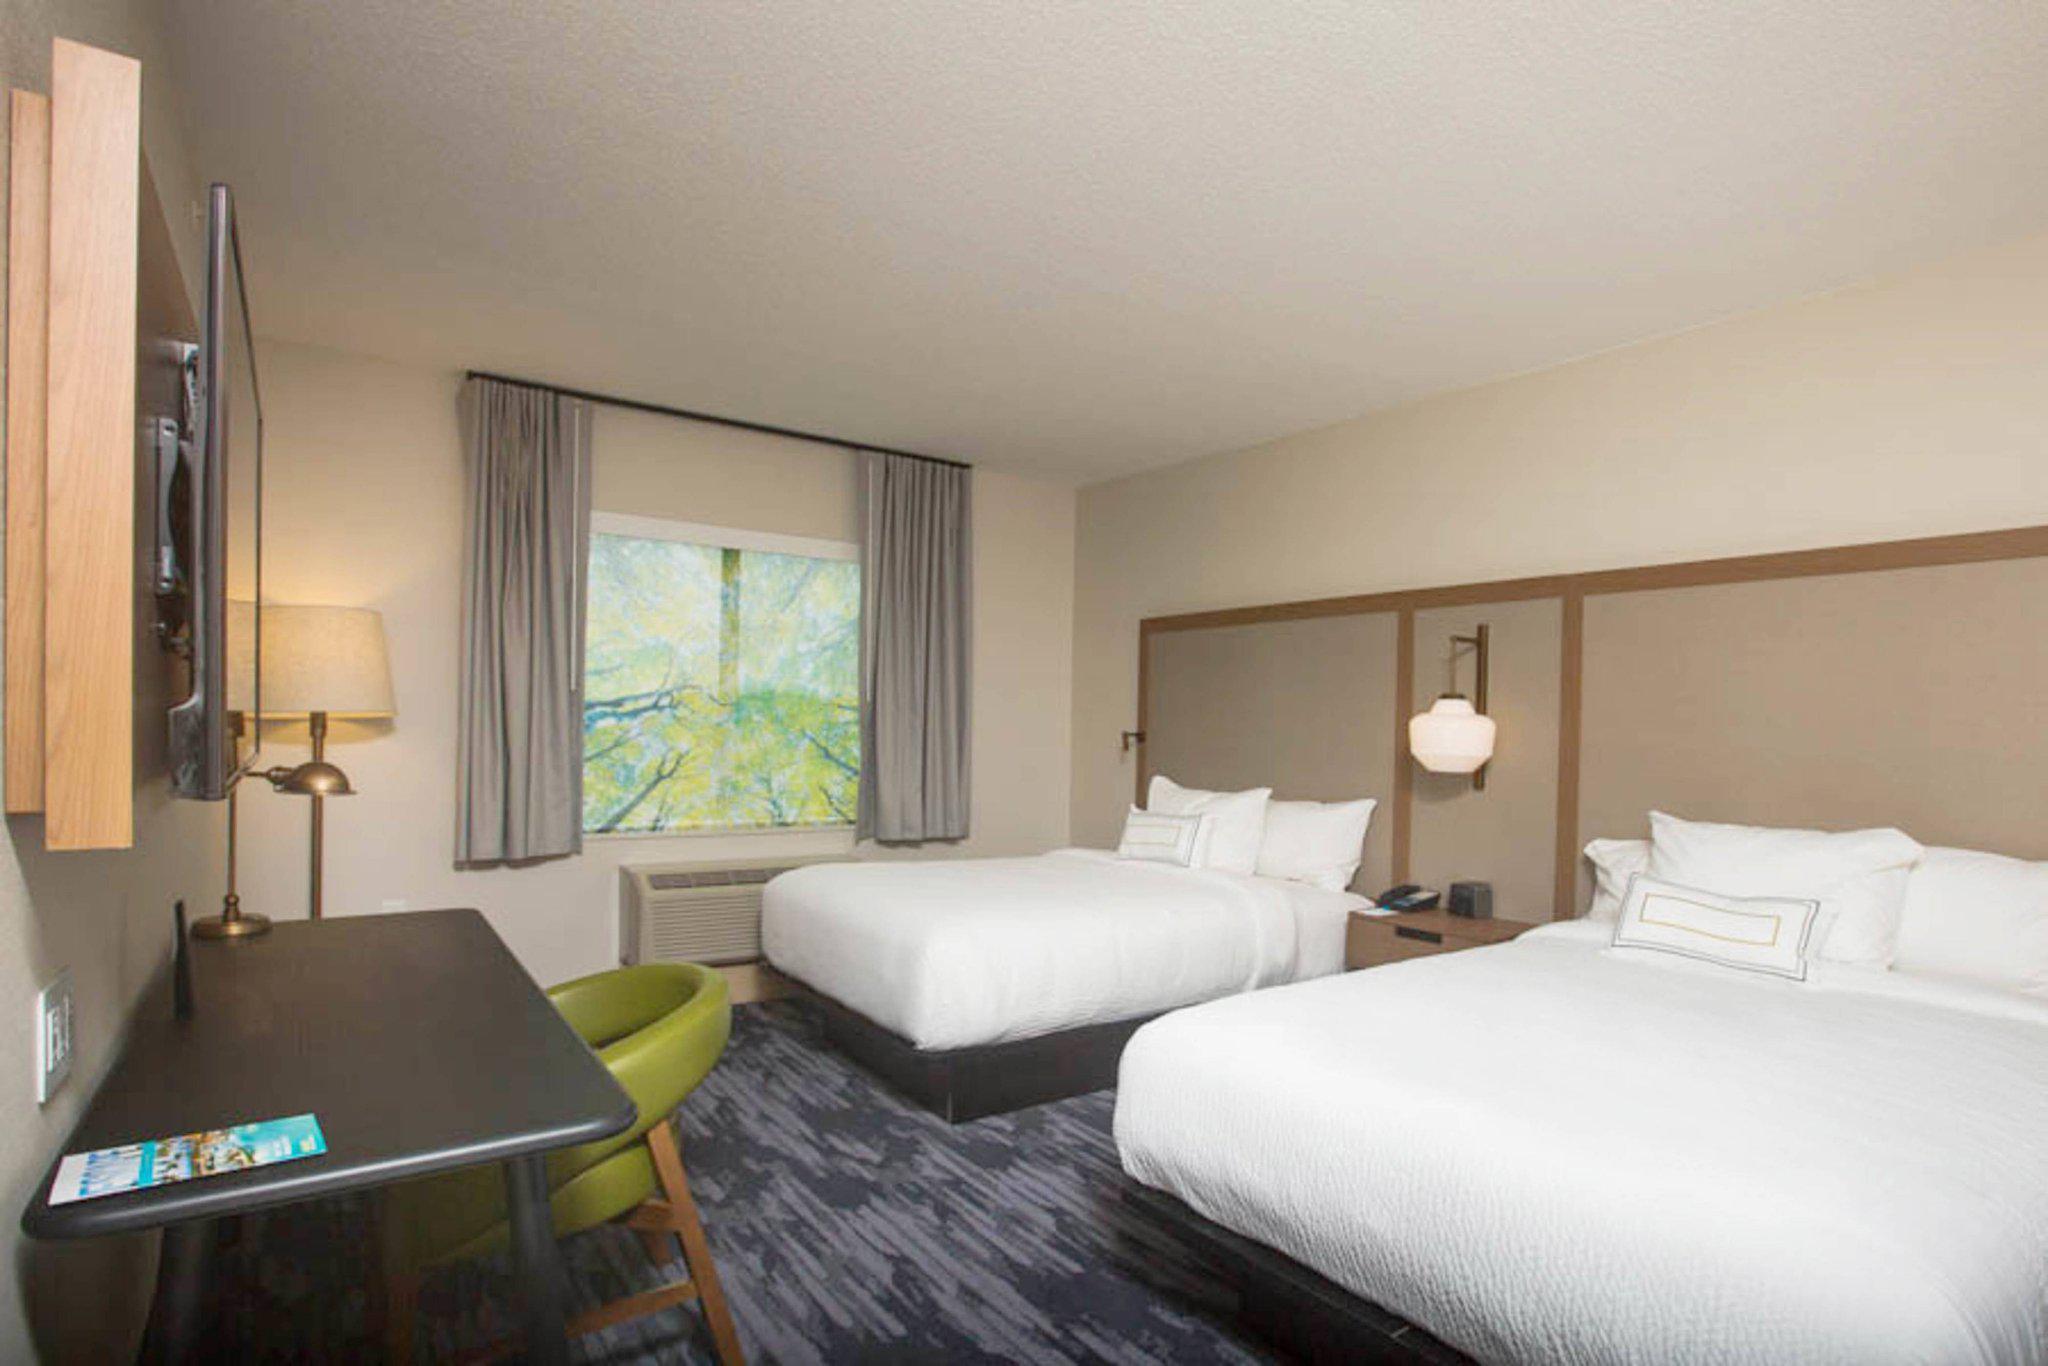 Fairfield Inn & Suites by Marriott Philadelphia Broomall/Newtown Square